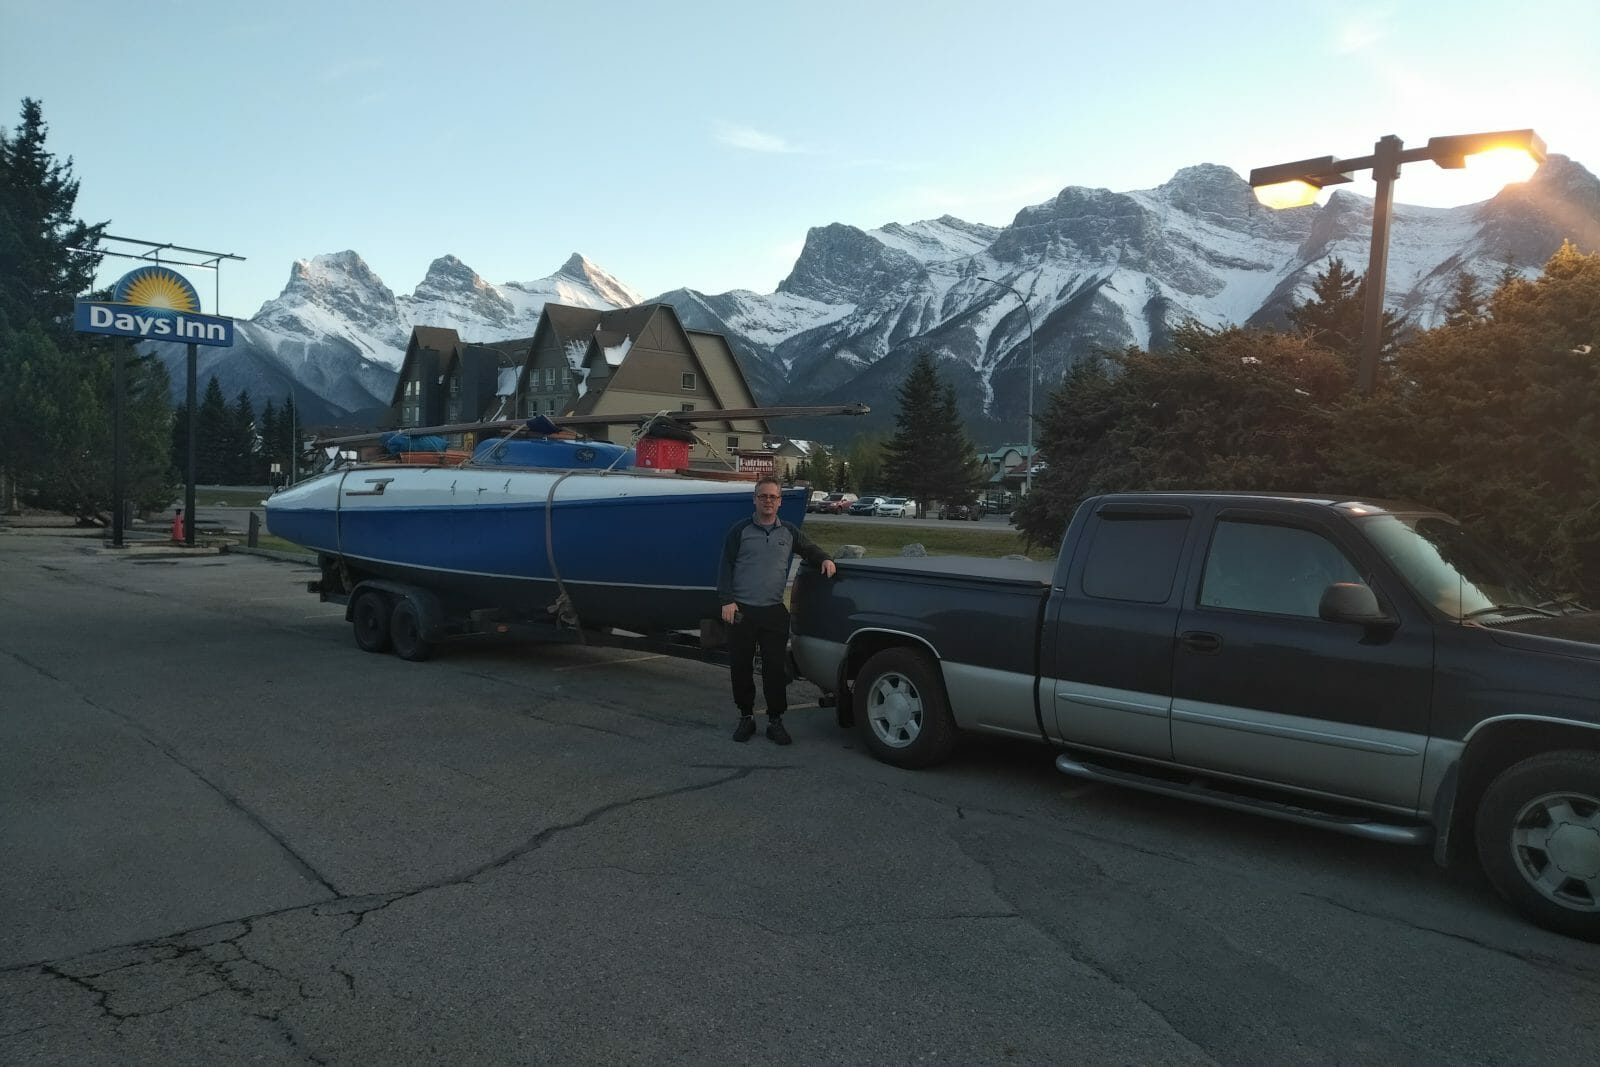 A38 - across Canada